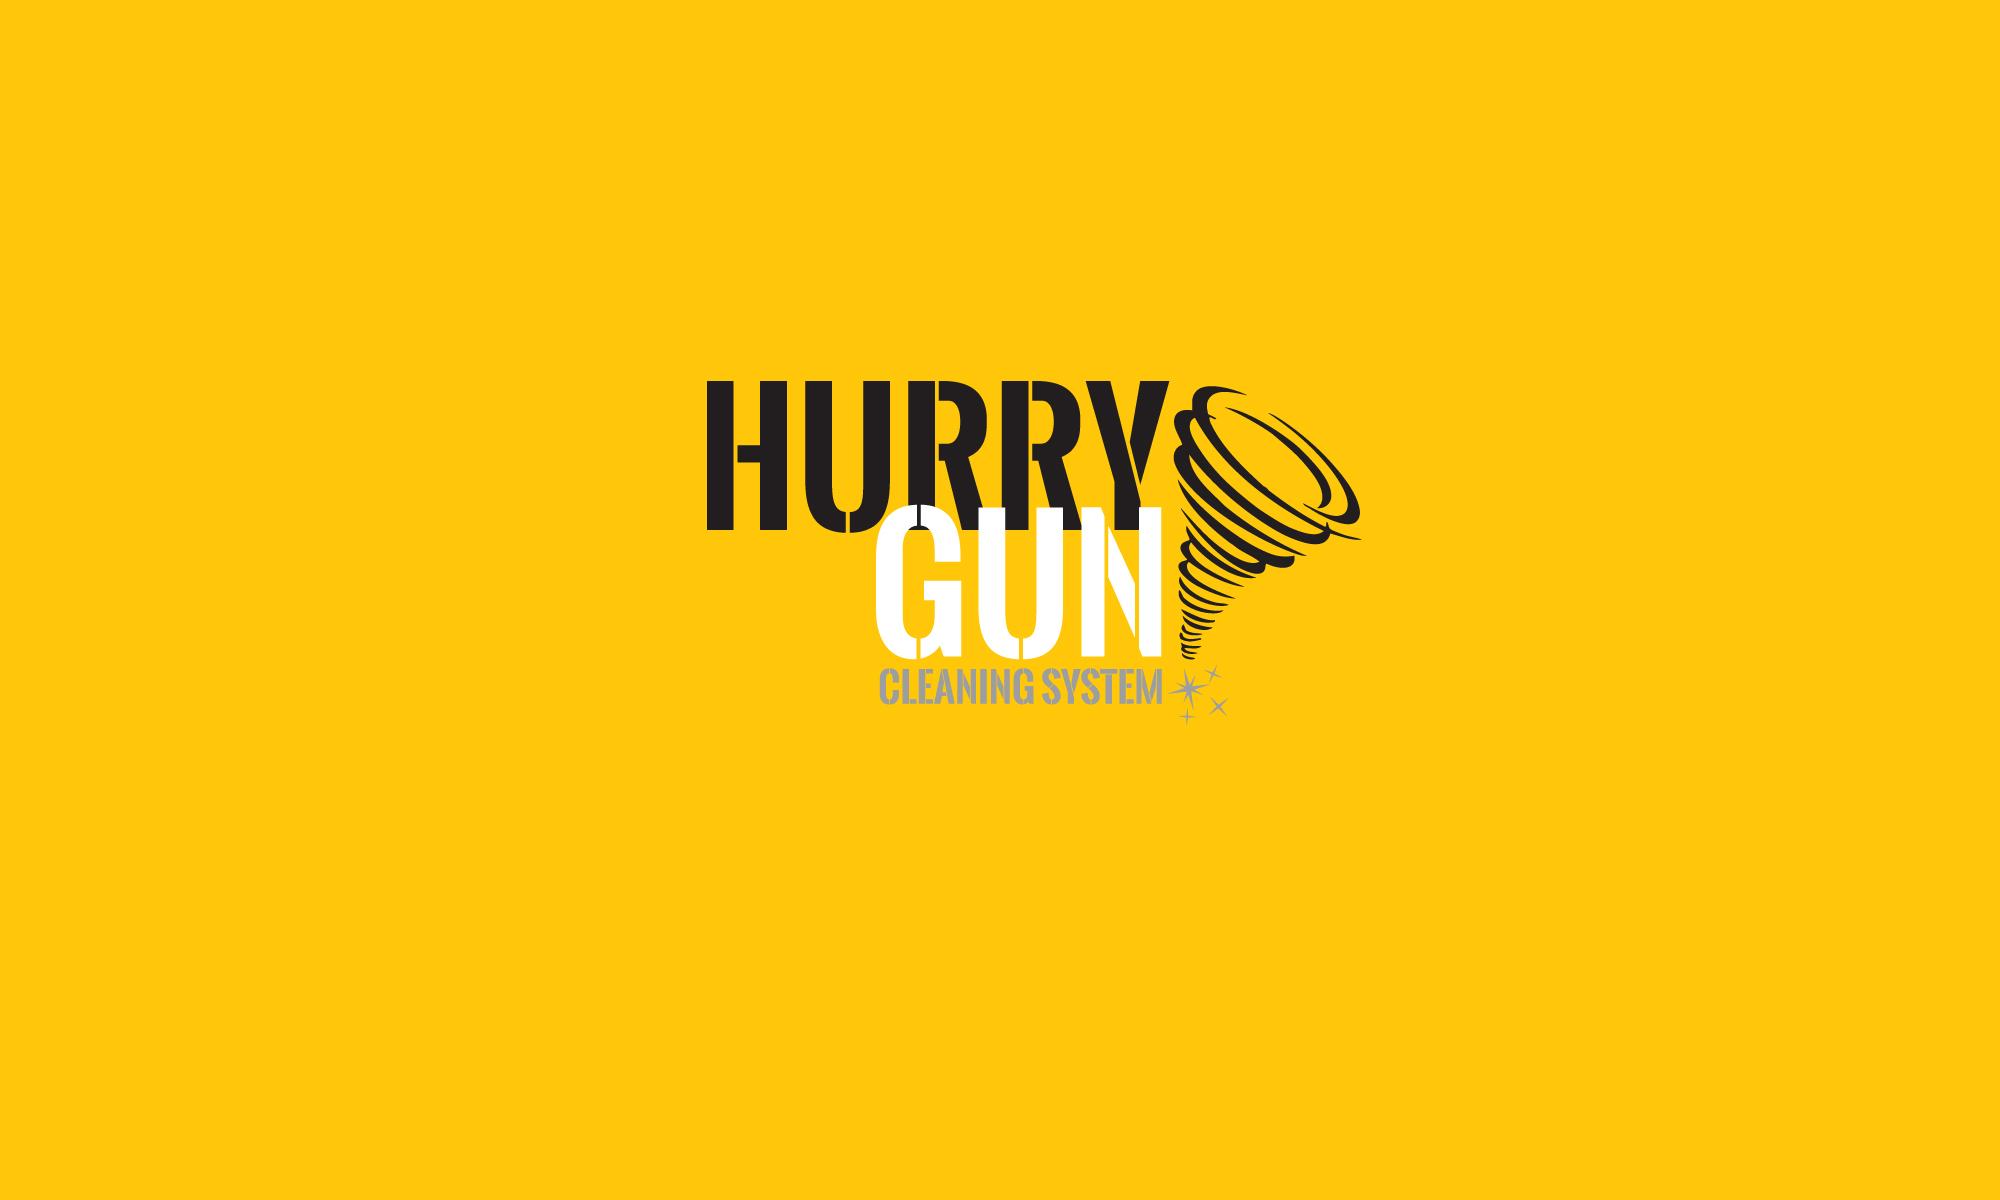 hurrygun.hu